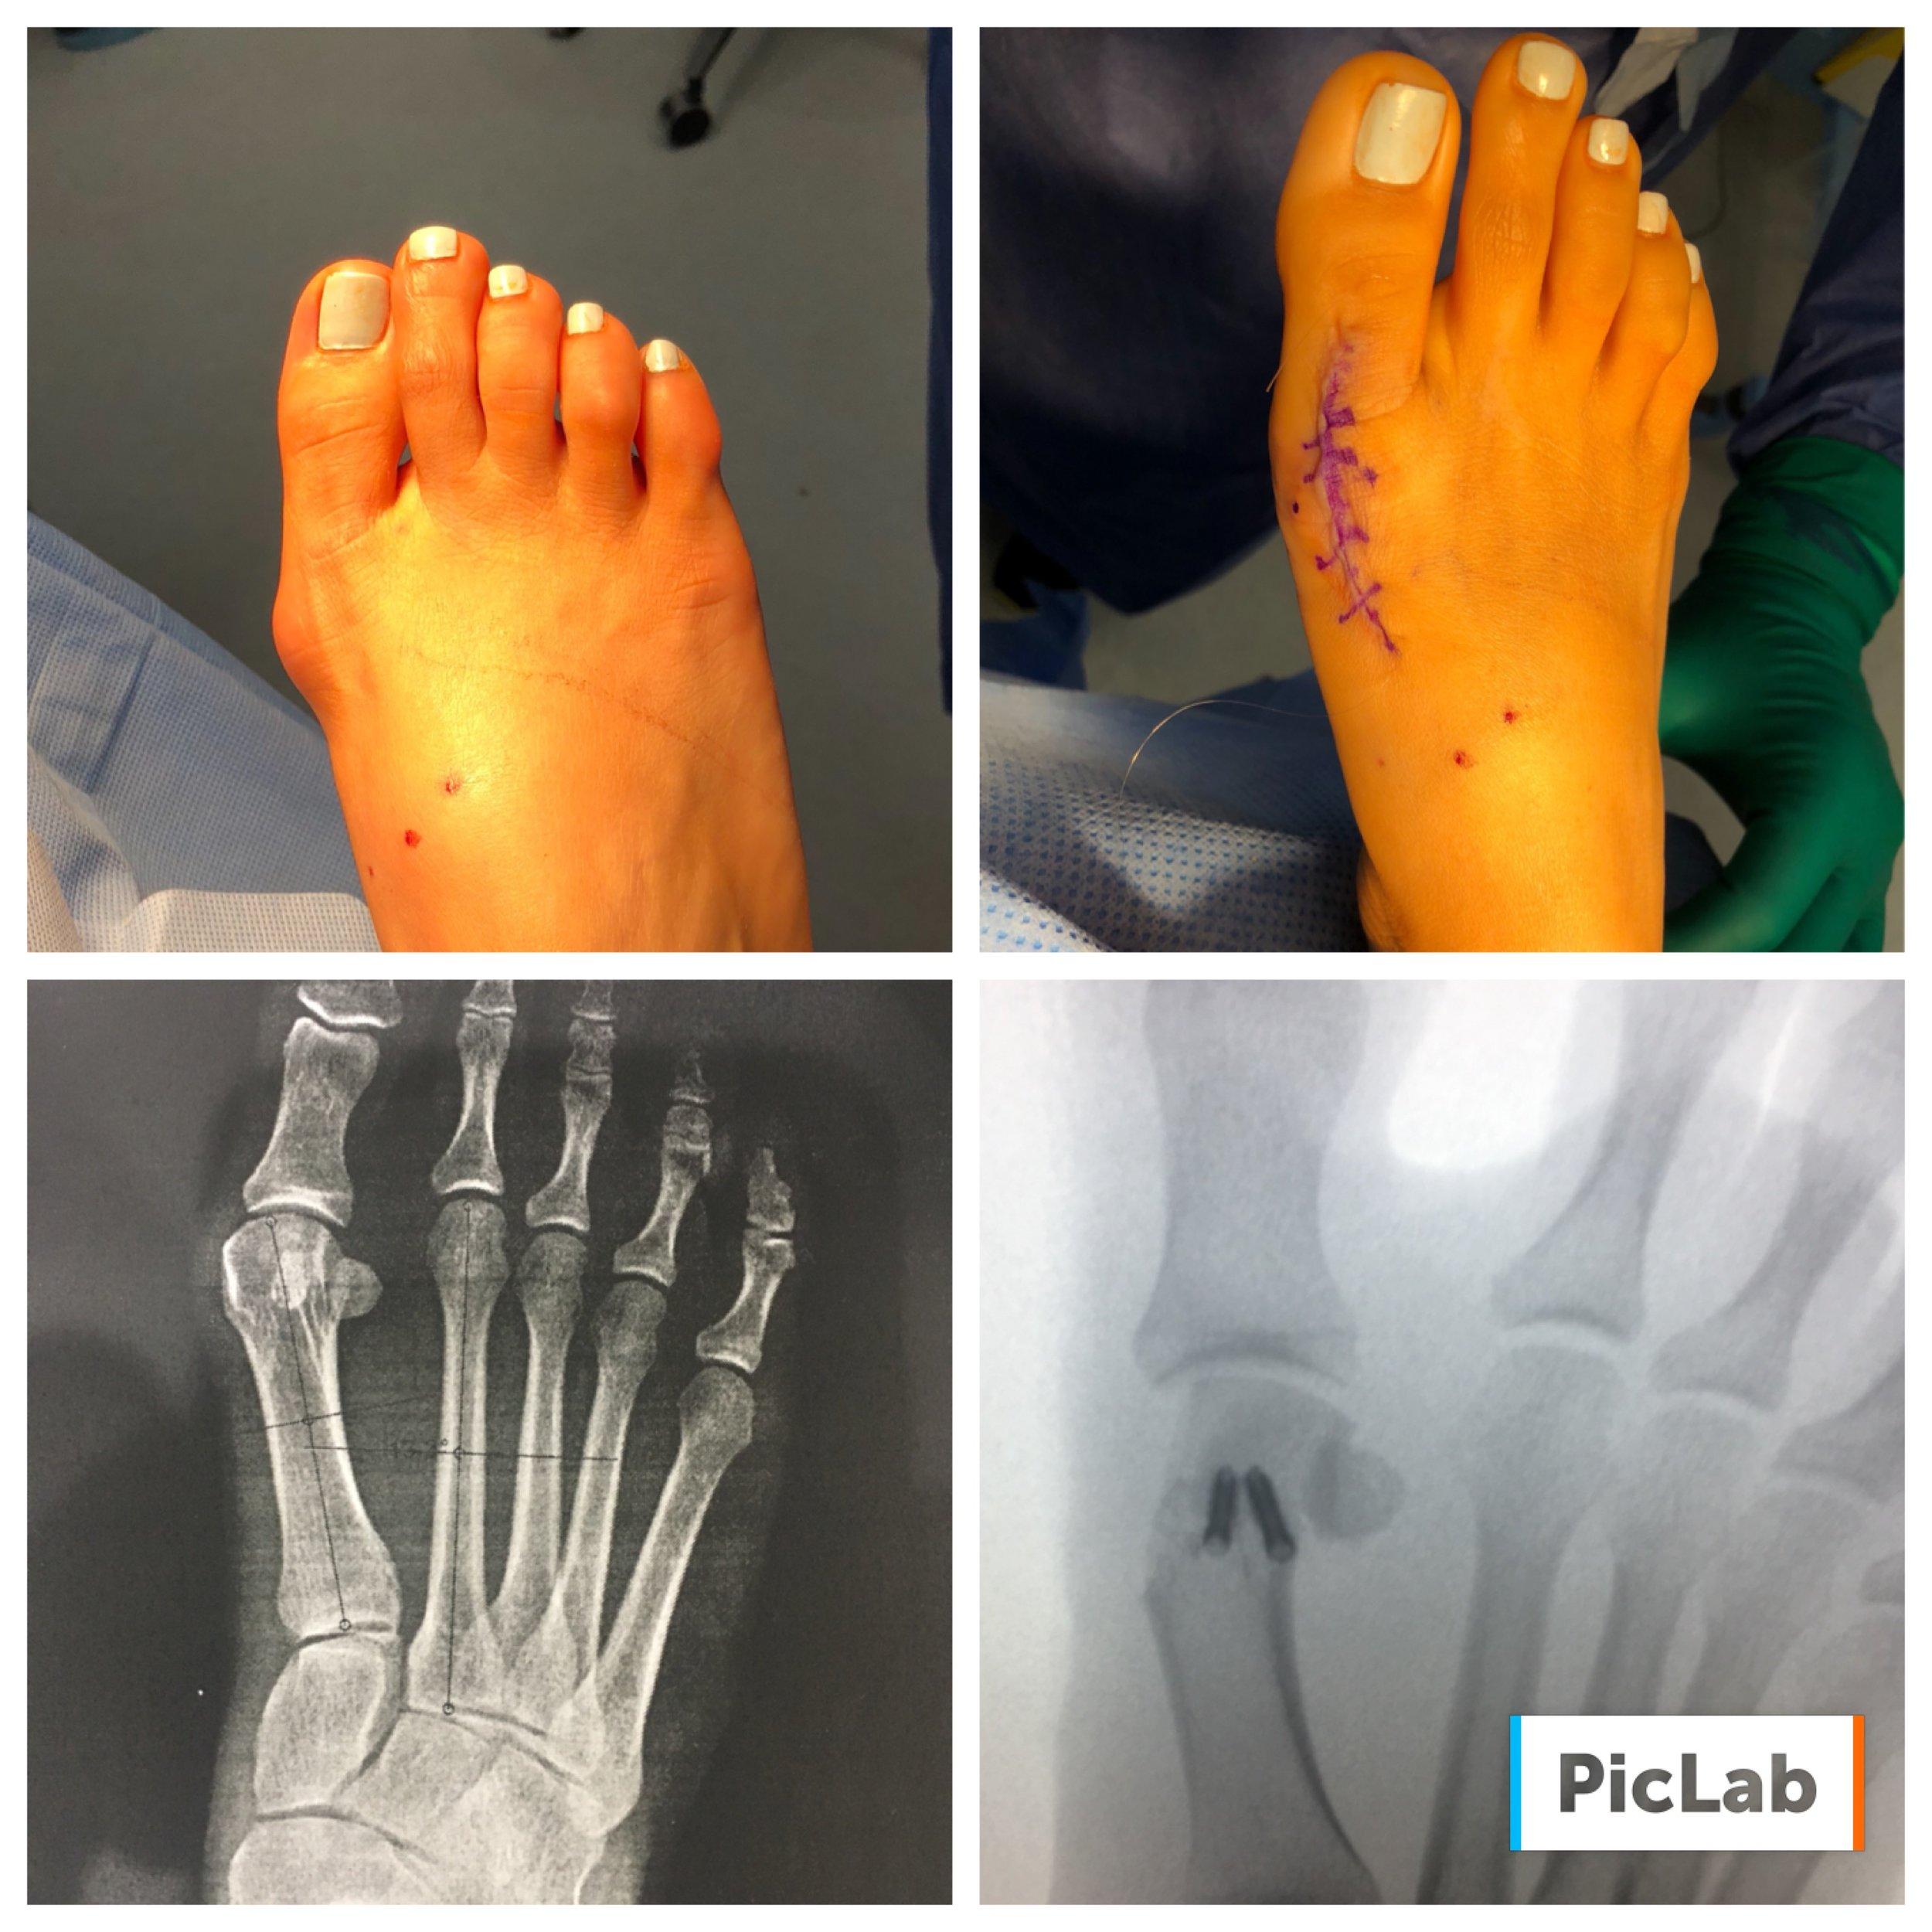 4 weeks status post bunionectomy